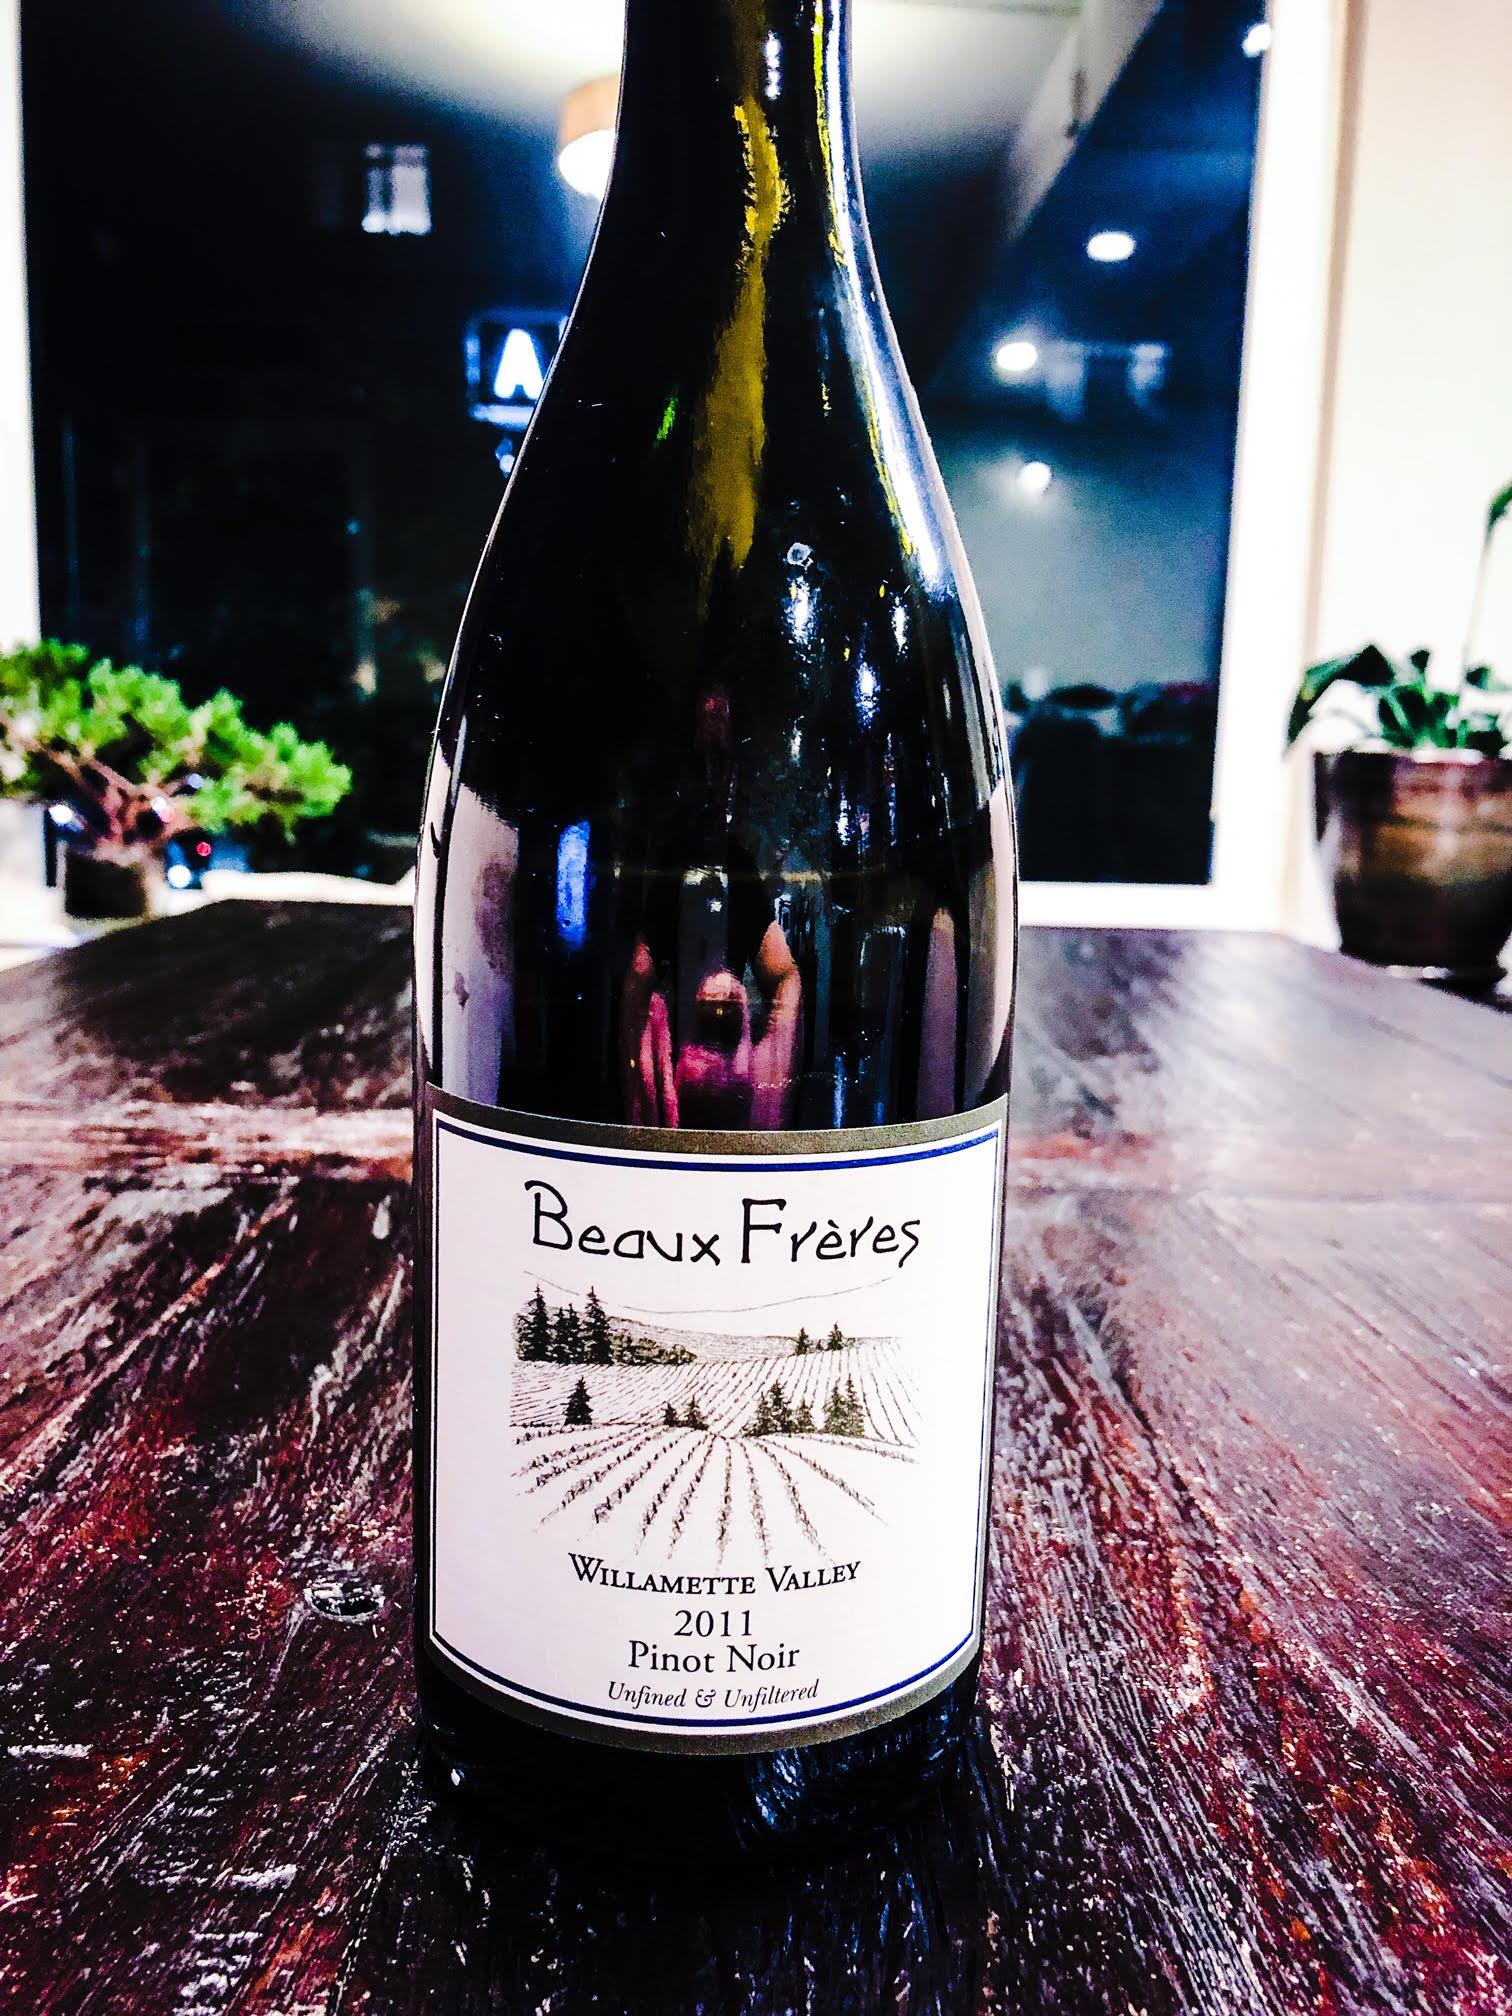 Beaux Freres 2011 Pinot.jpg